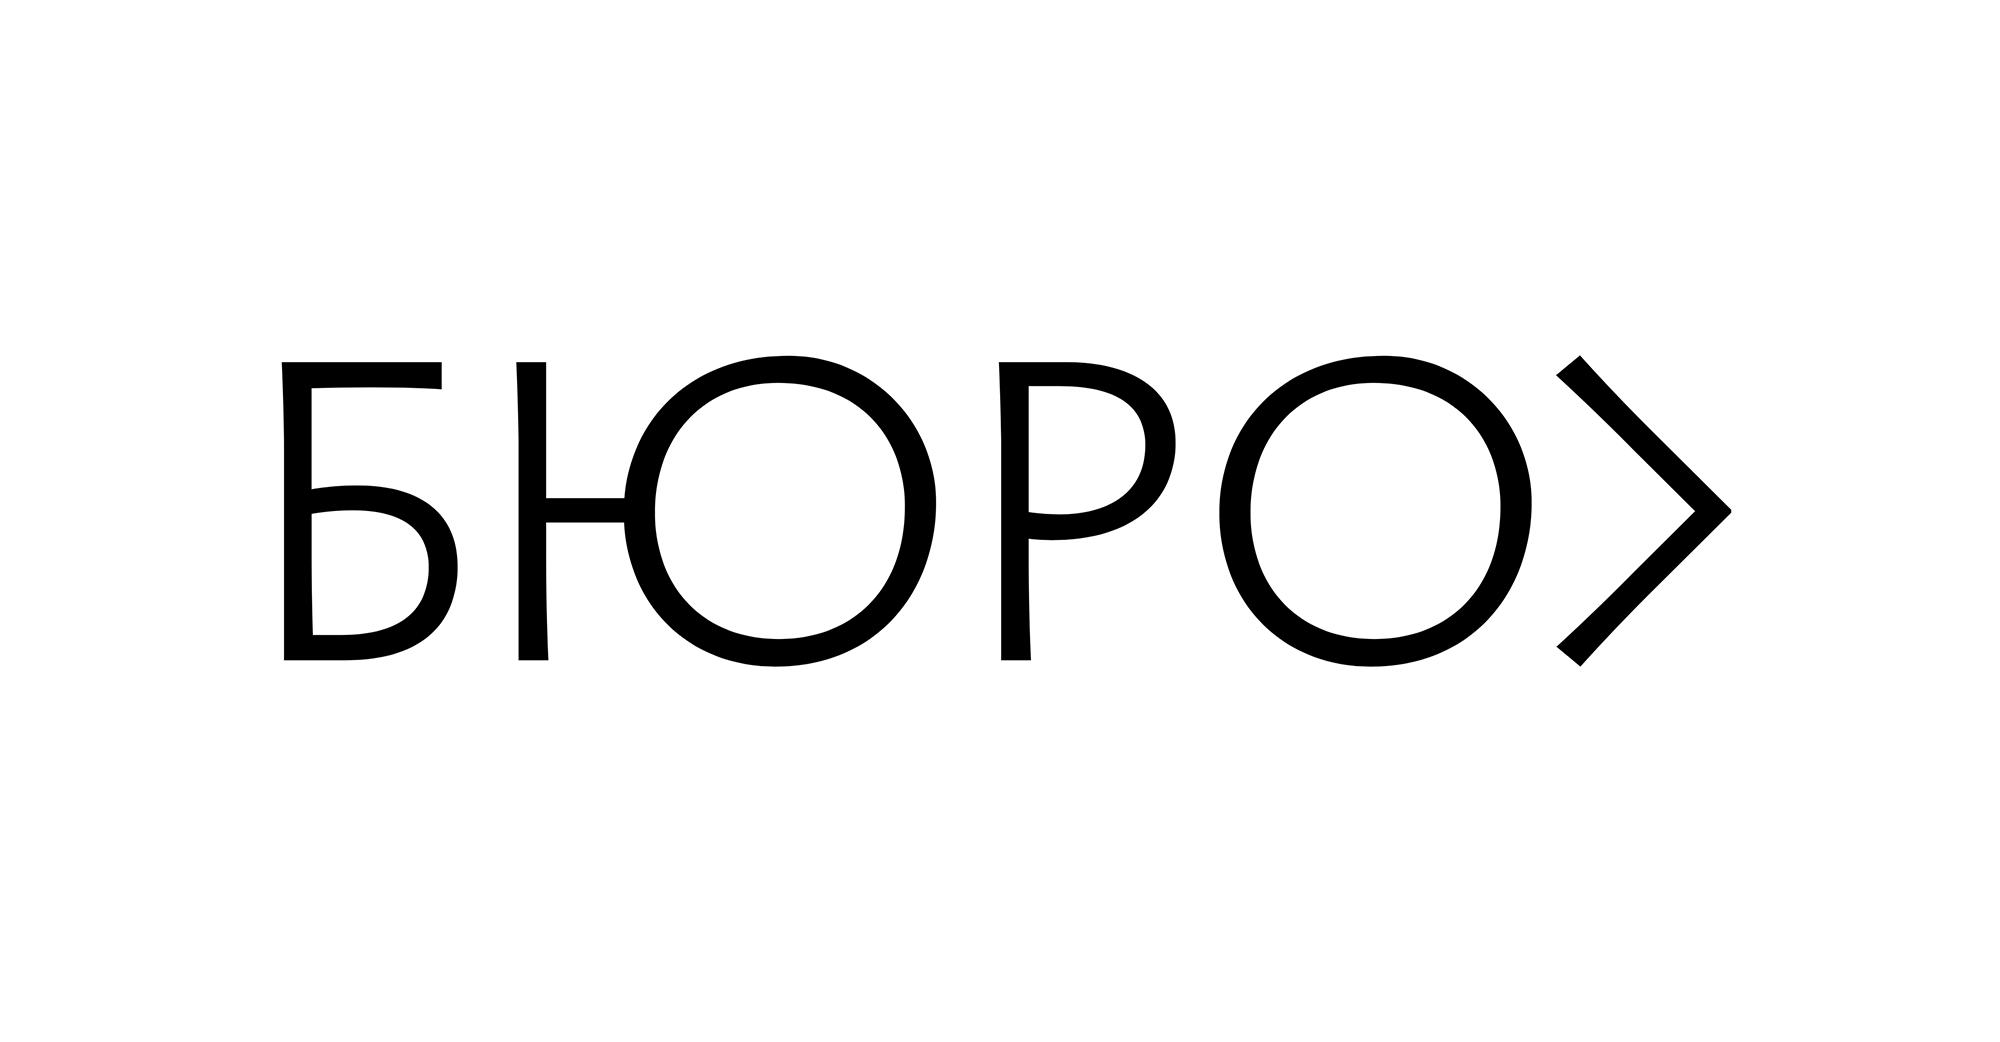 Дизайн бюро артема горбунова